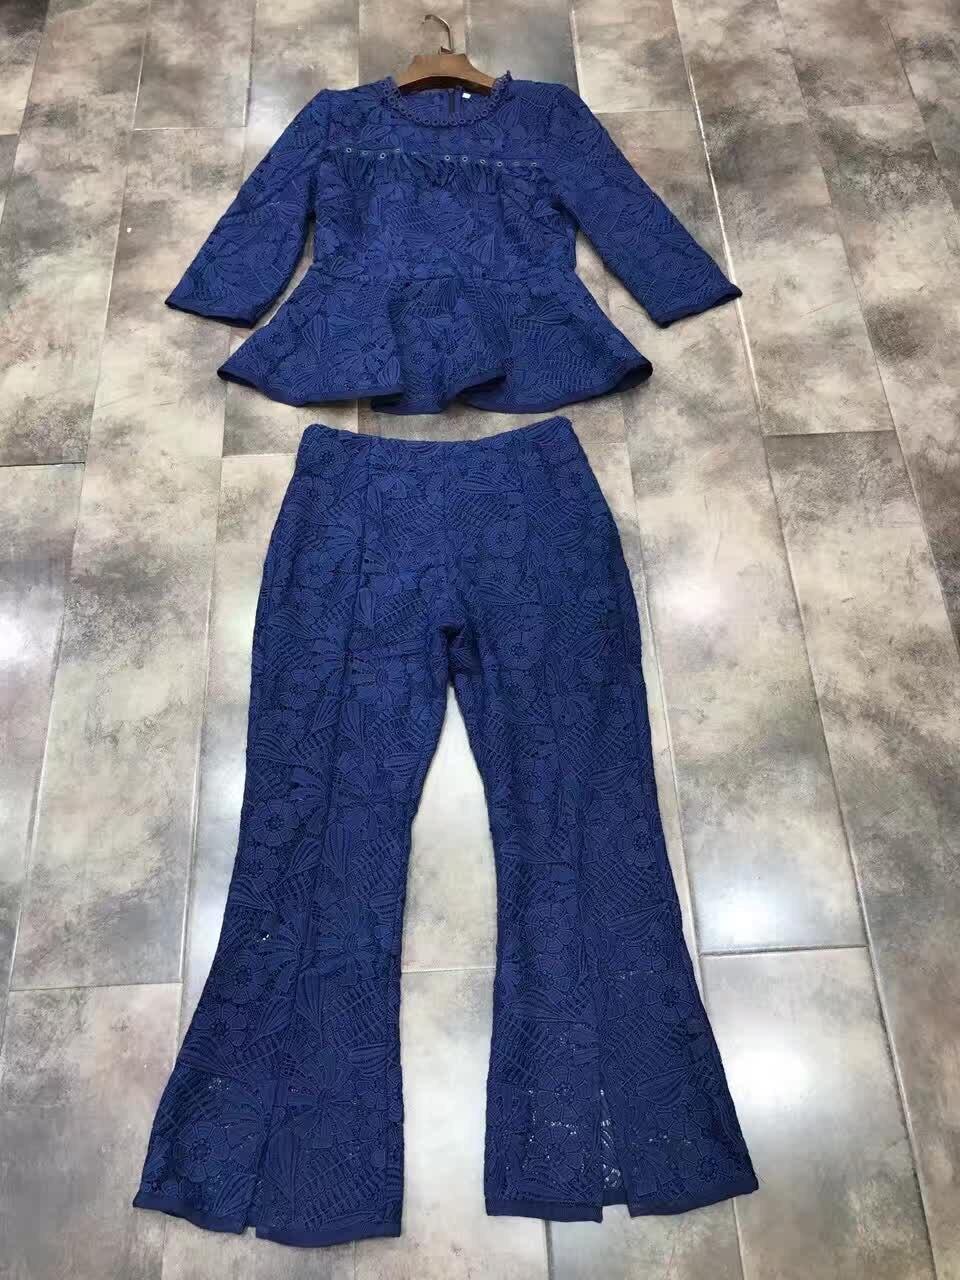 Limited Cotton Silk Zipper Tracksuits 2017 Spring New font b Women s b font Lace font